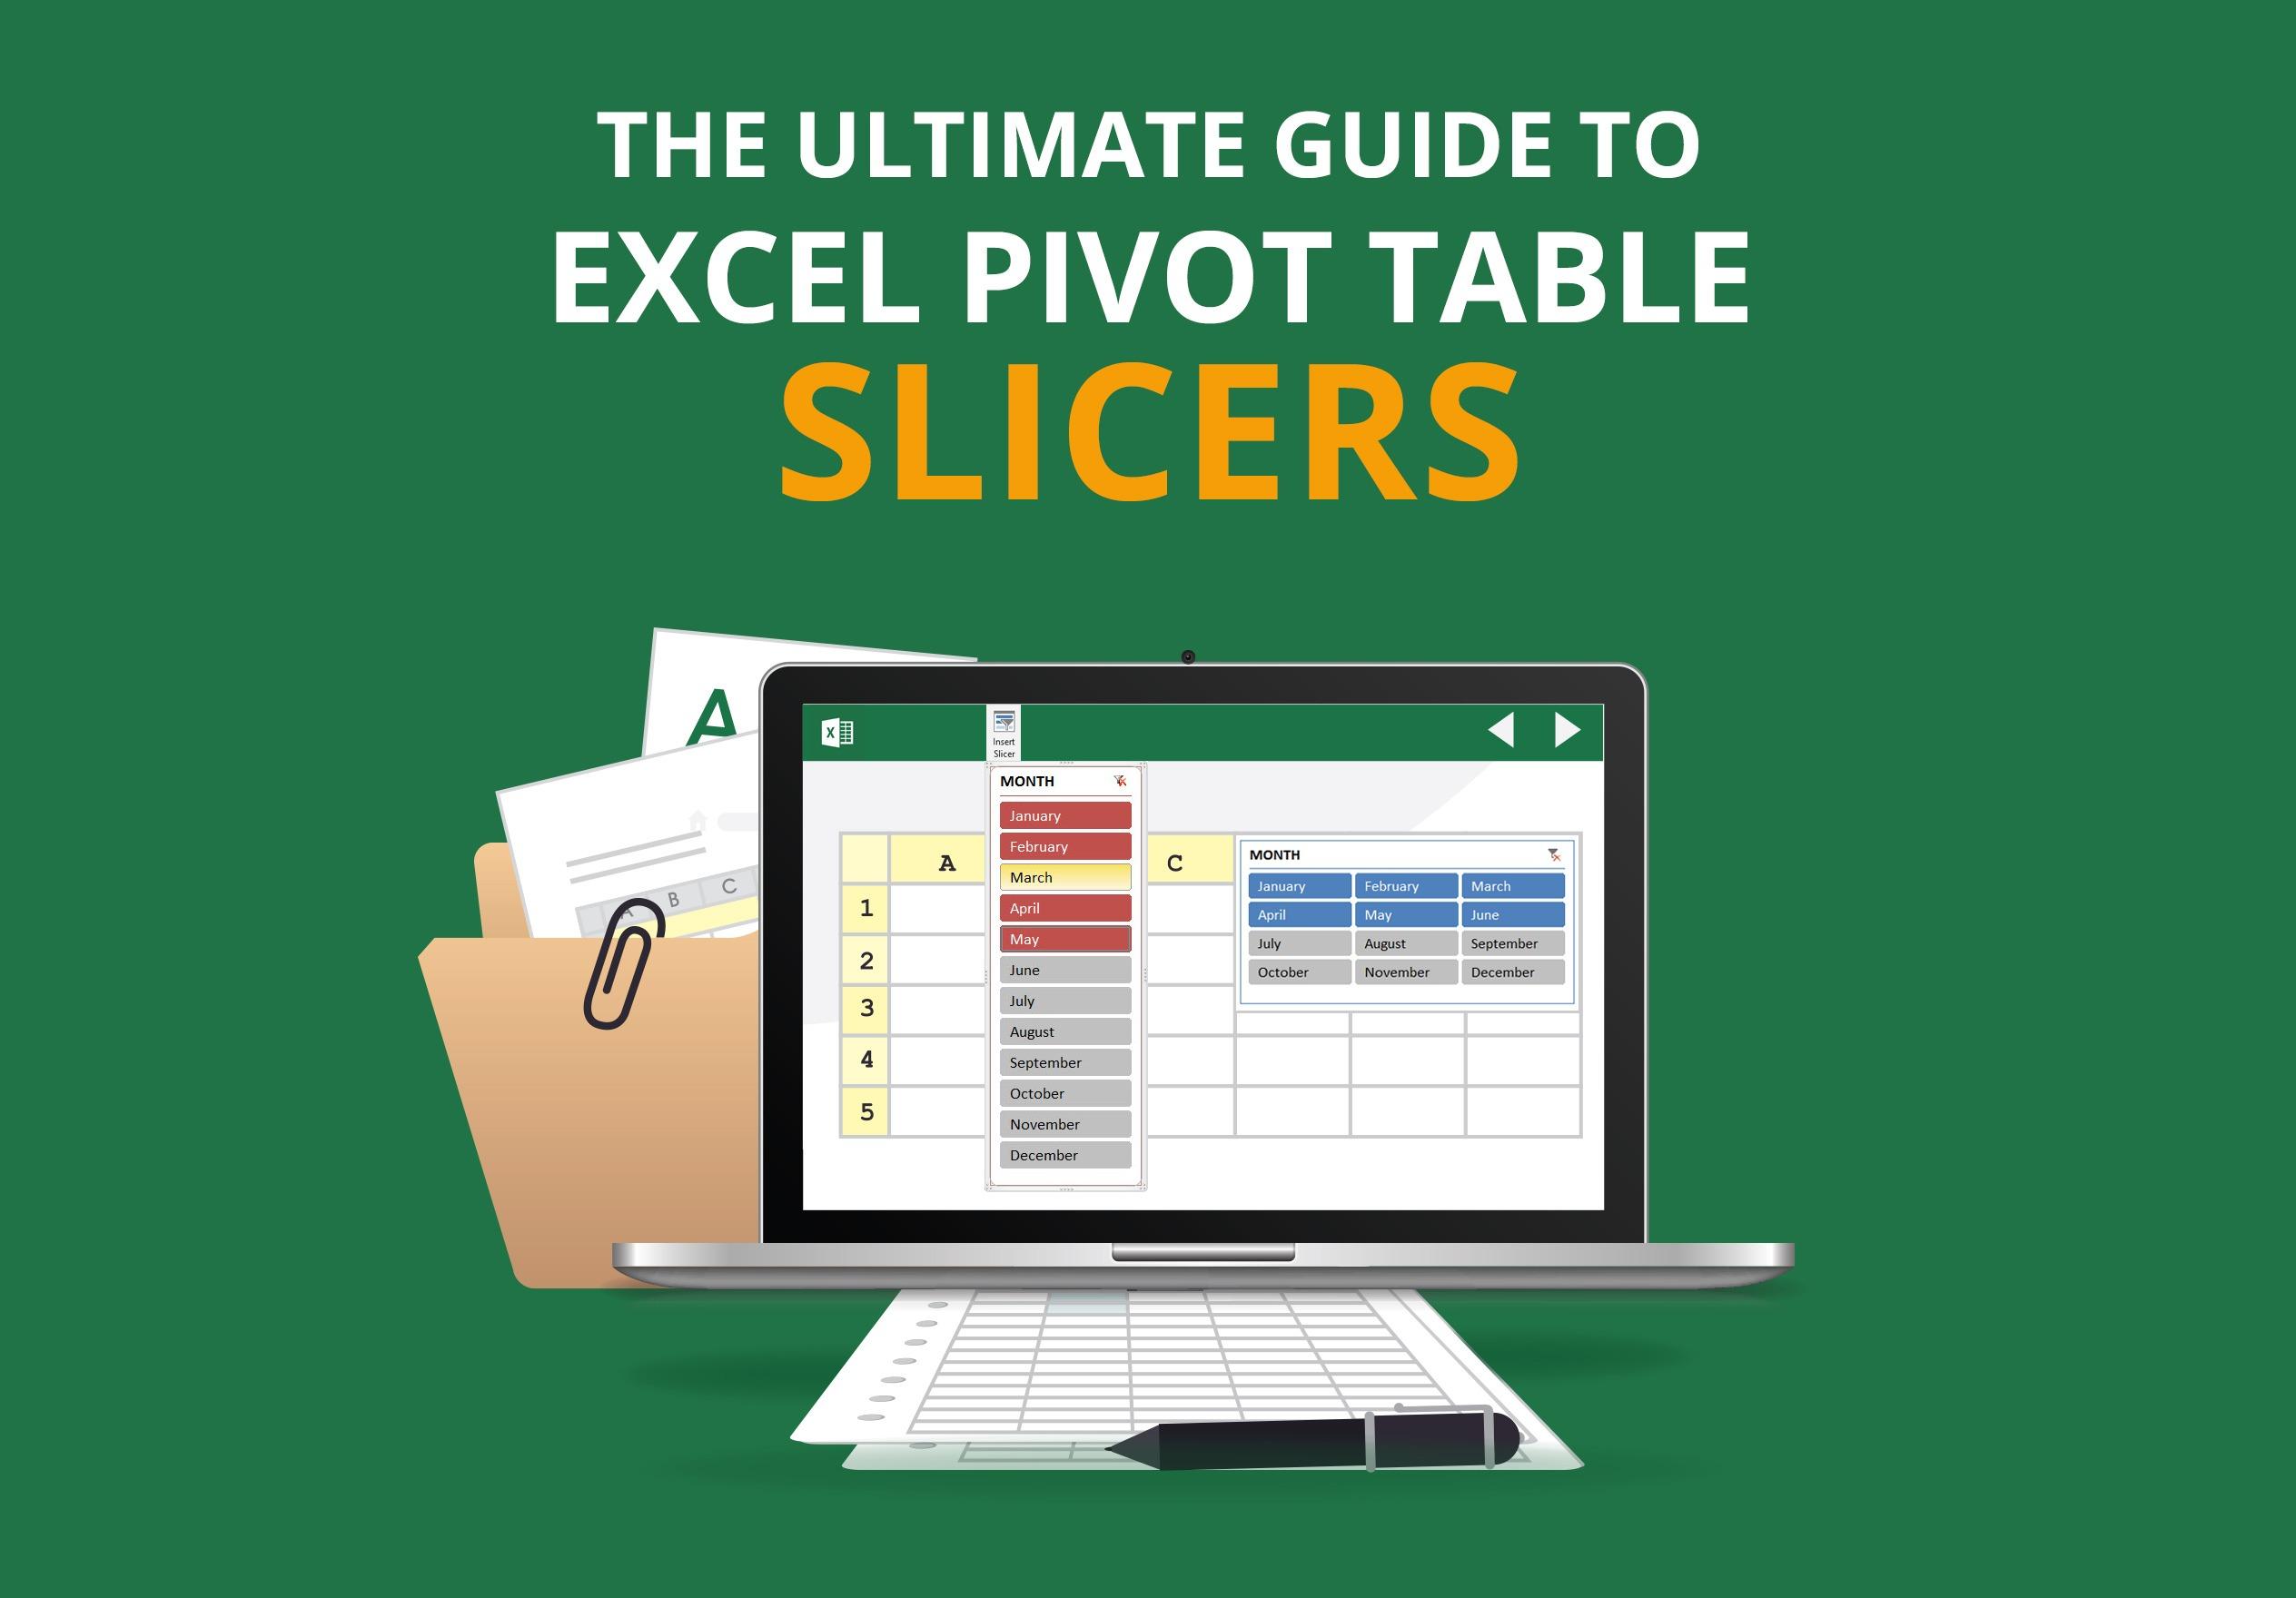 Free Microsoft Excel Tutorials